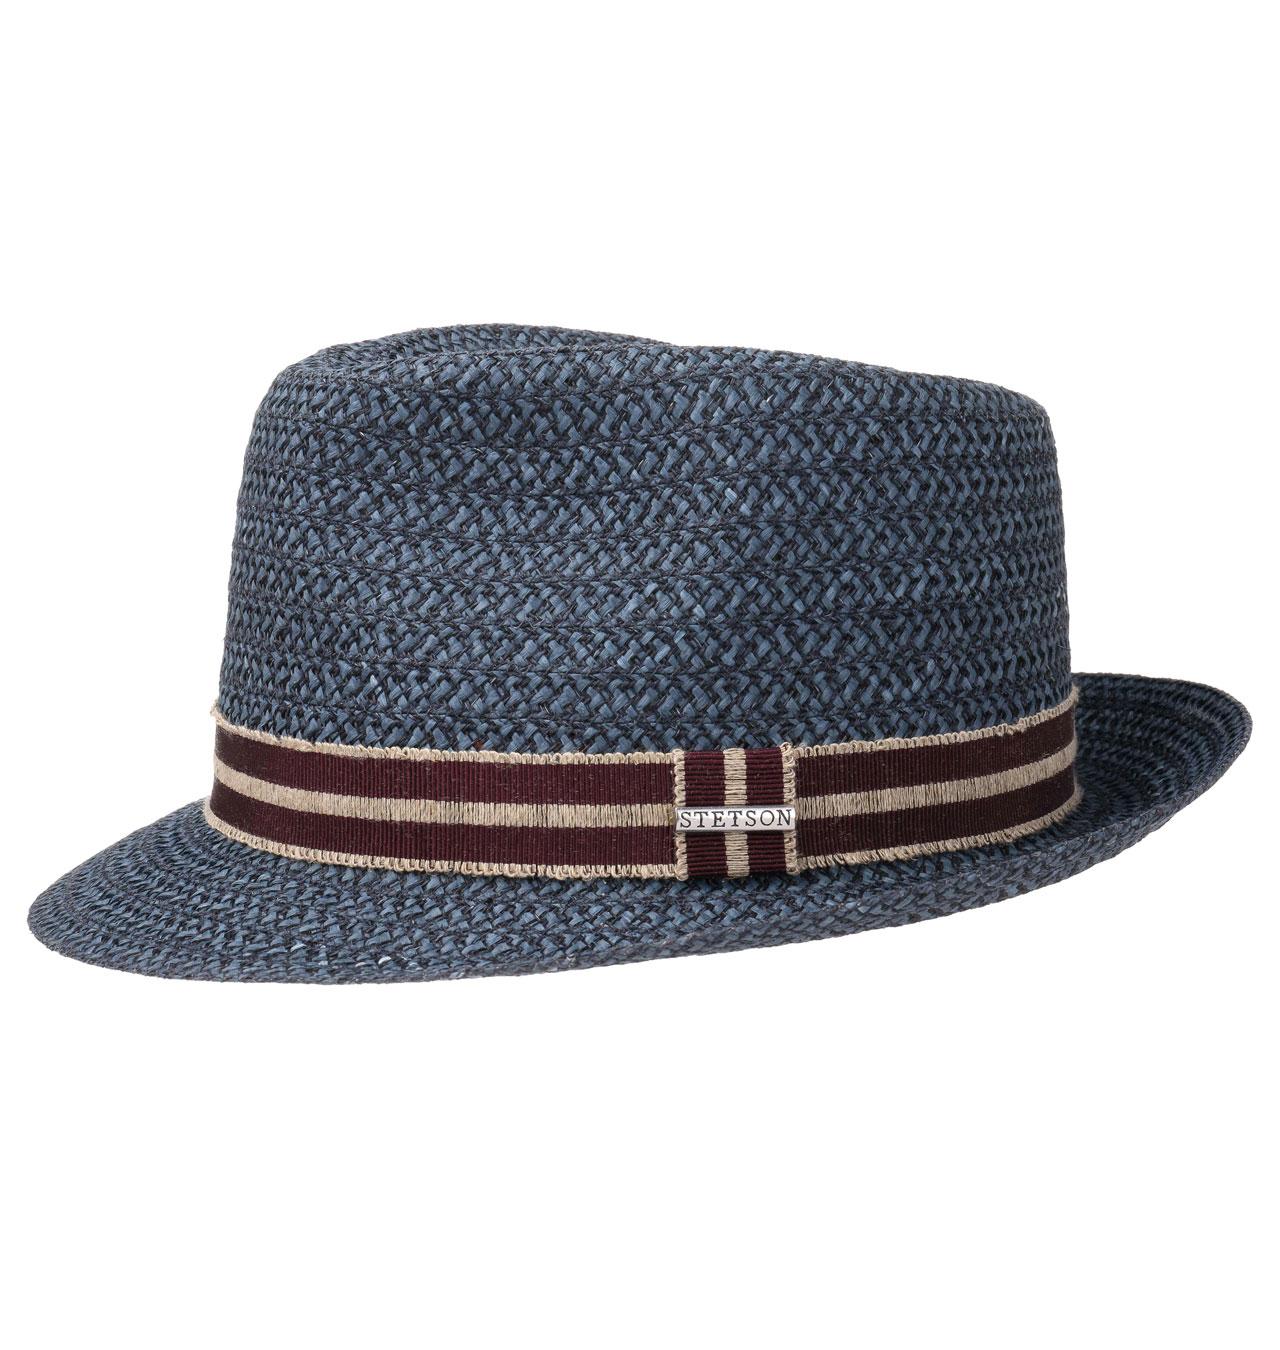 ffc09fbbb26f Stetson - Fritch Fedora Straw Hat - Navy